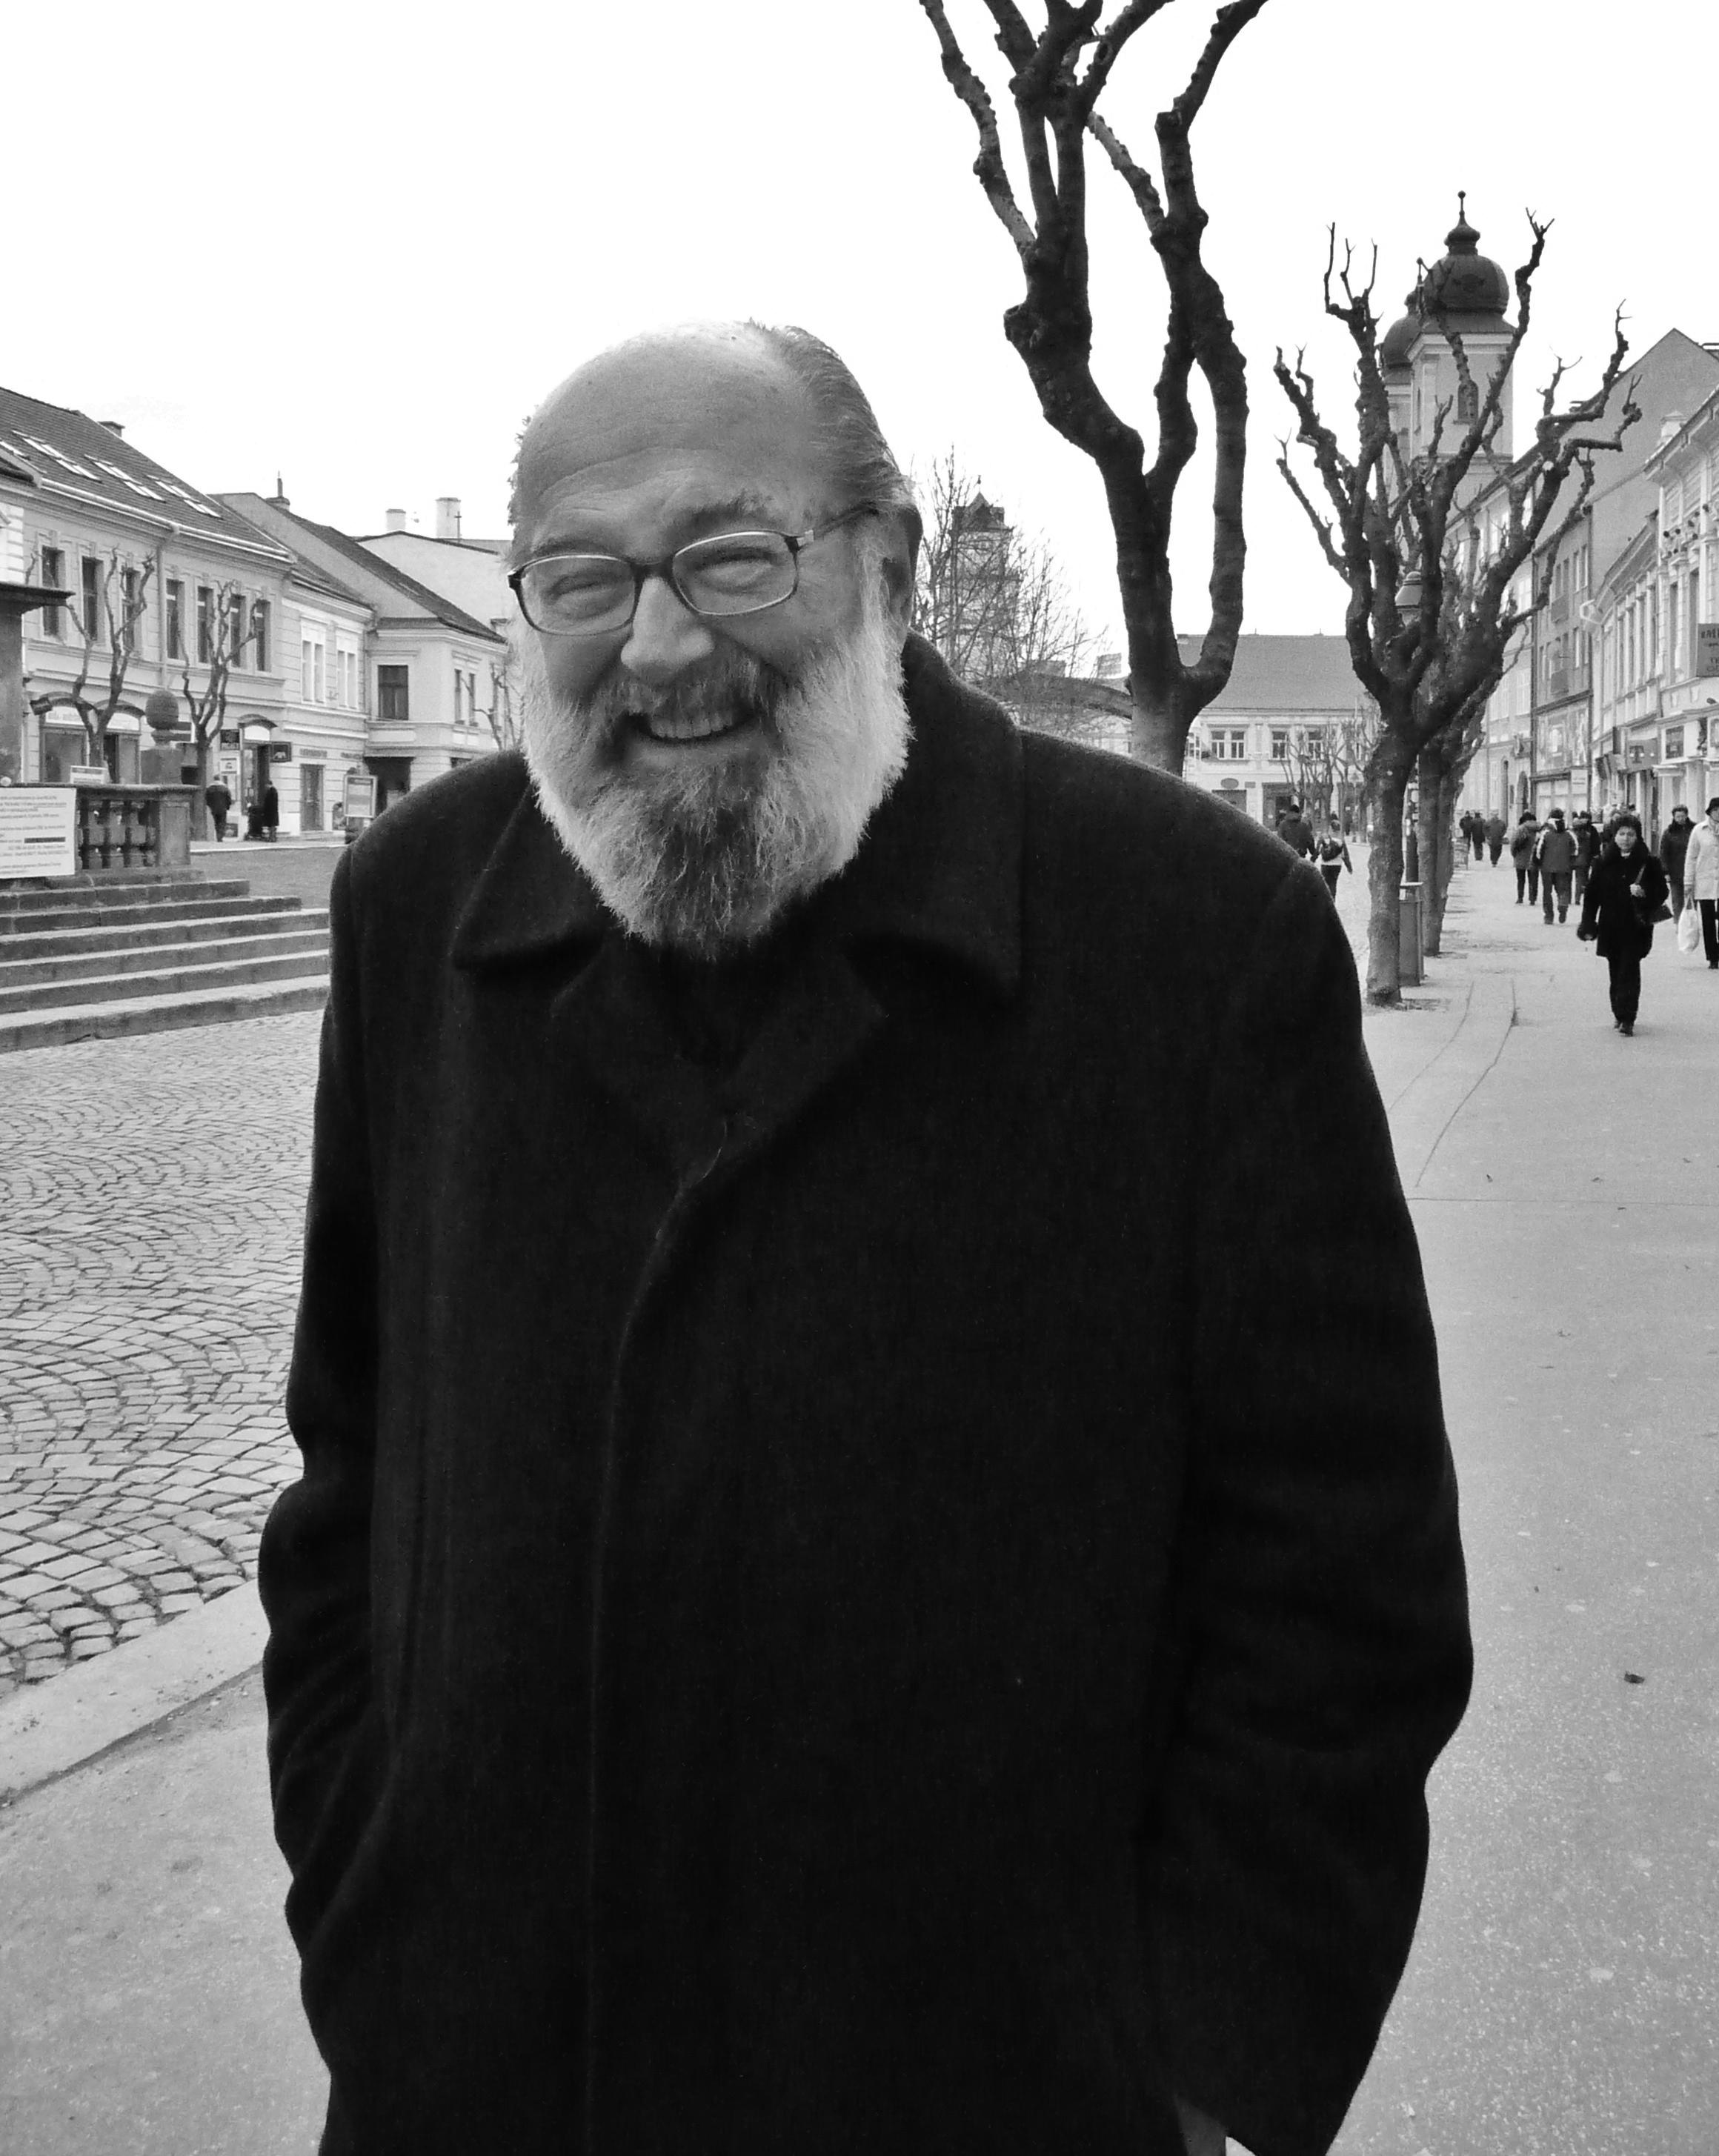 Kornel Földvári v Trenčíne (c) Peter Krištúfek.jpg